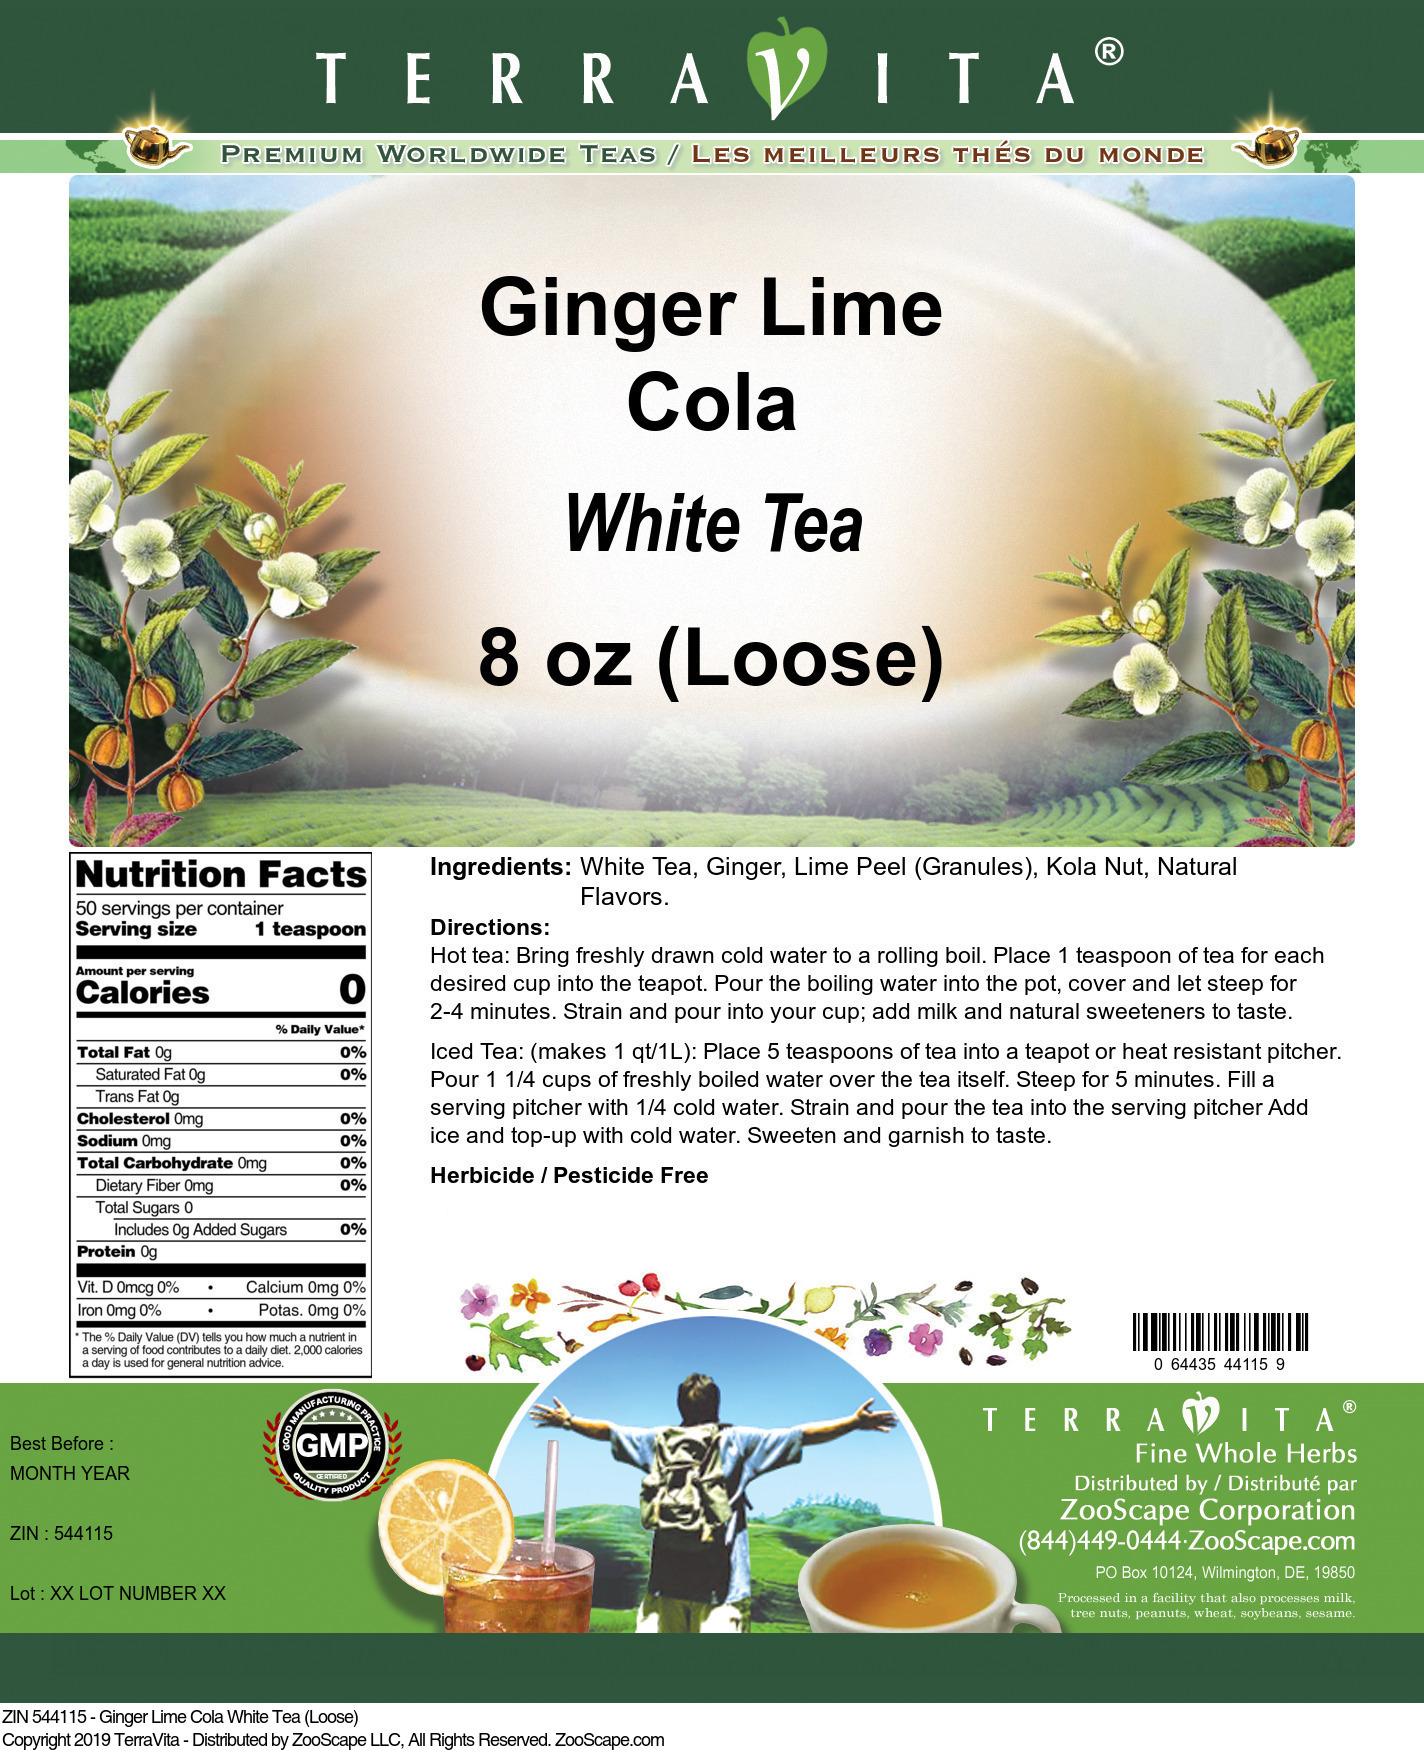 Ginger Lime Cola White Tea (Loose)